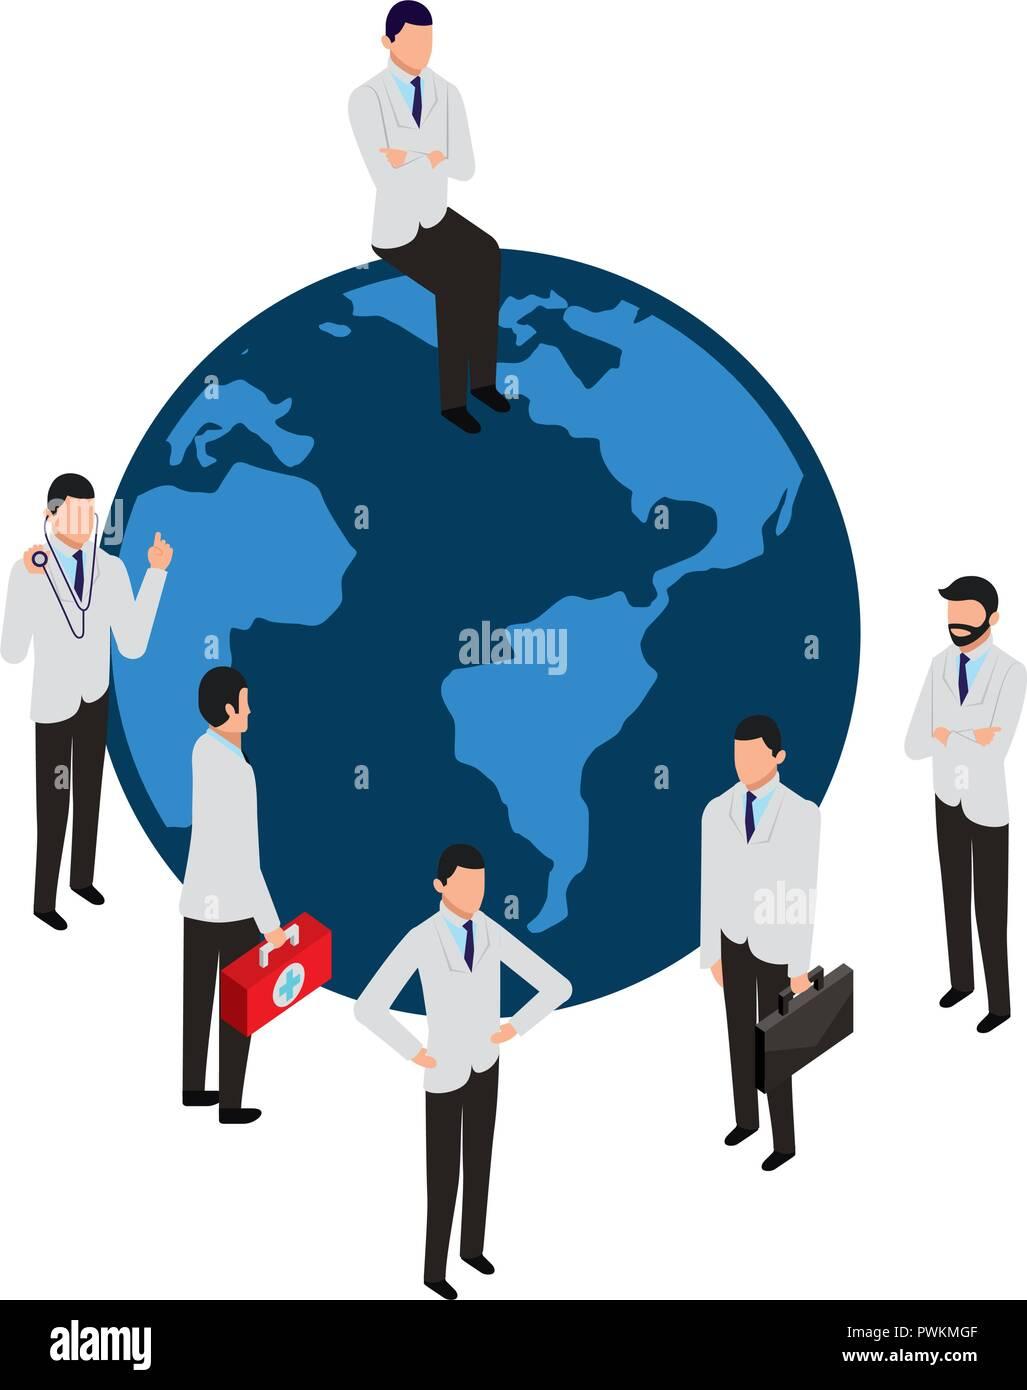 people staff medical world service vector illustration - Stock Vector